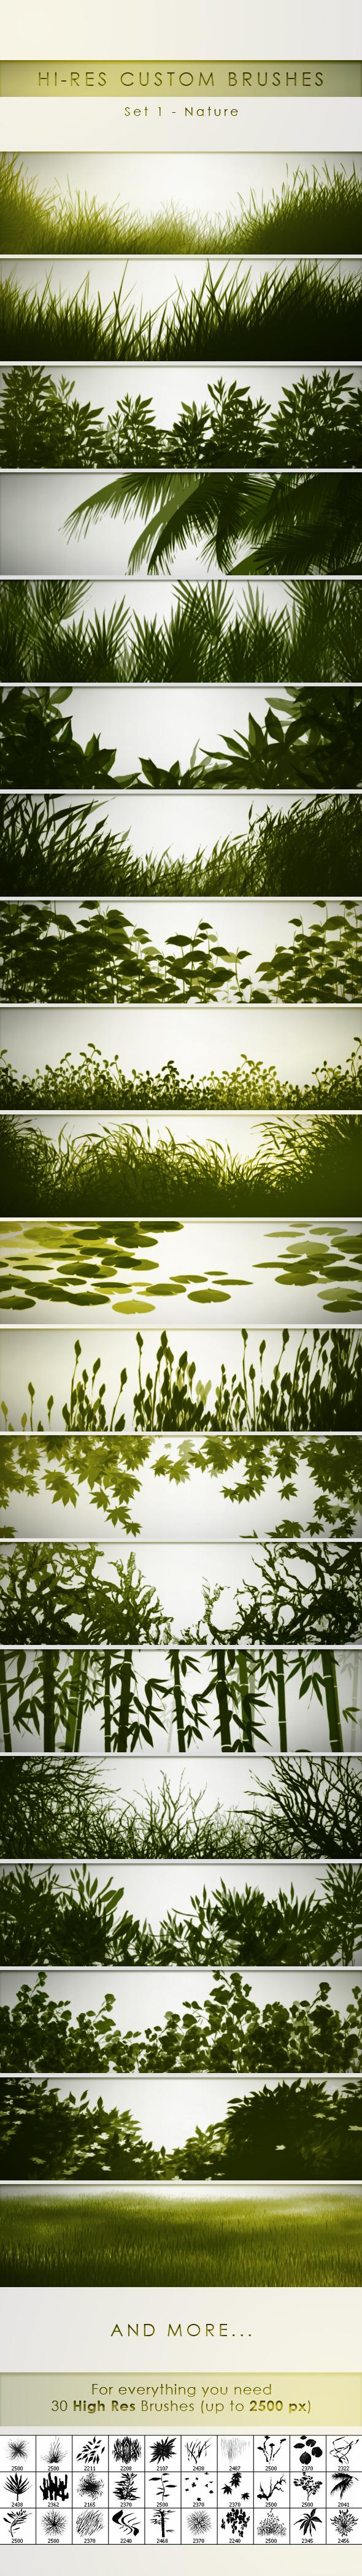 30 Hi-Res Custom Brushes Nature